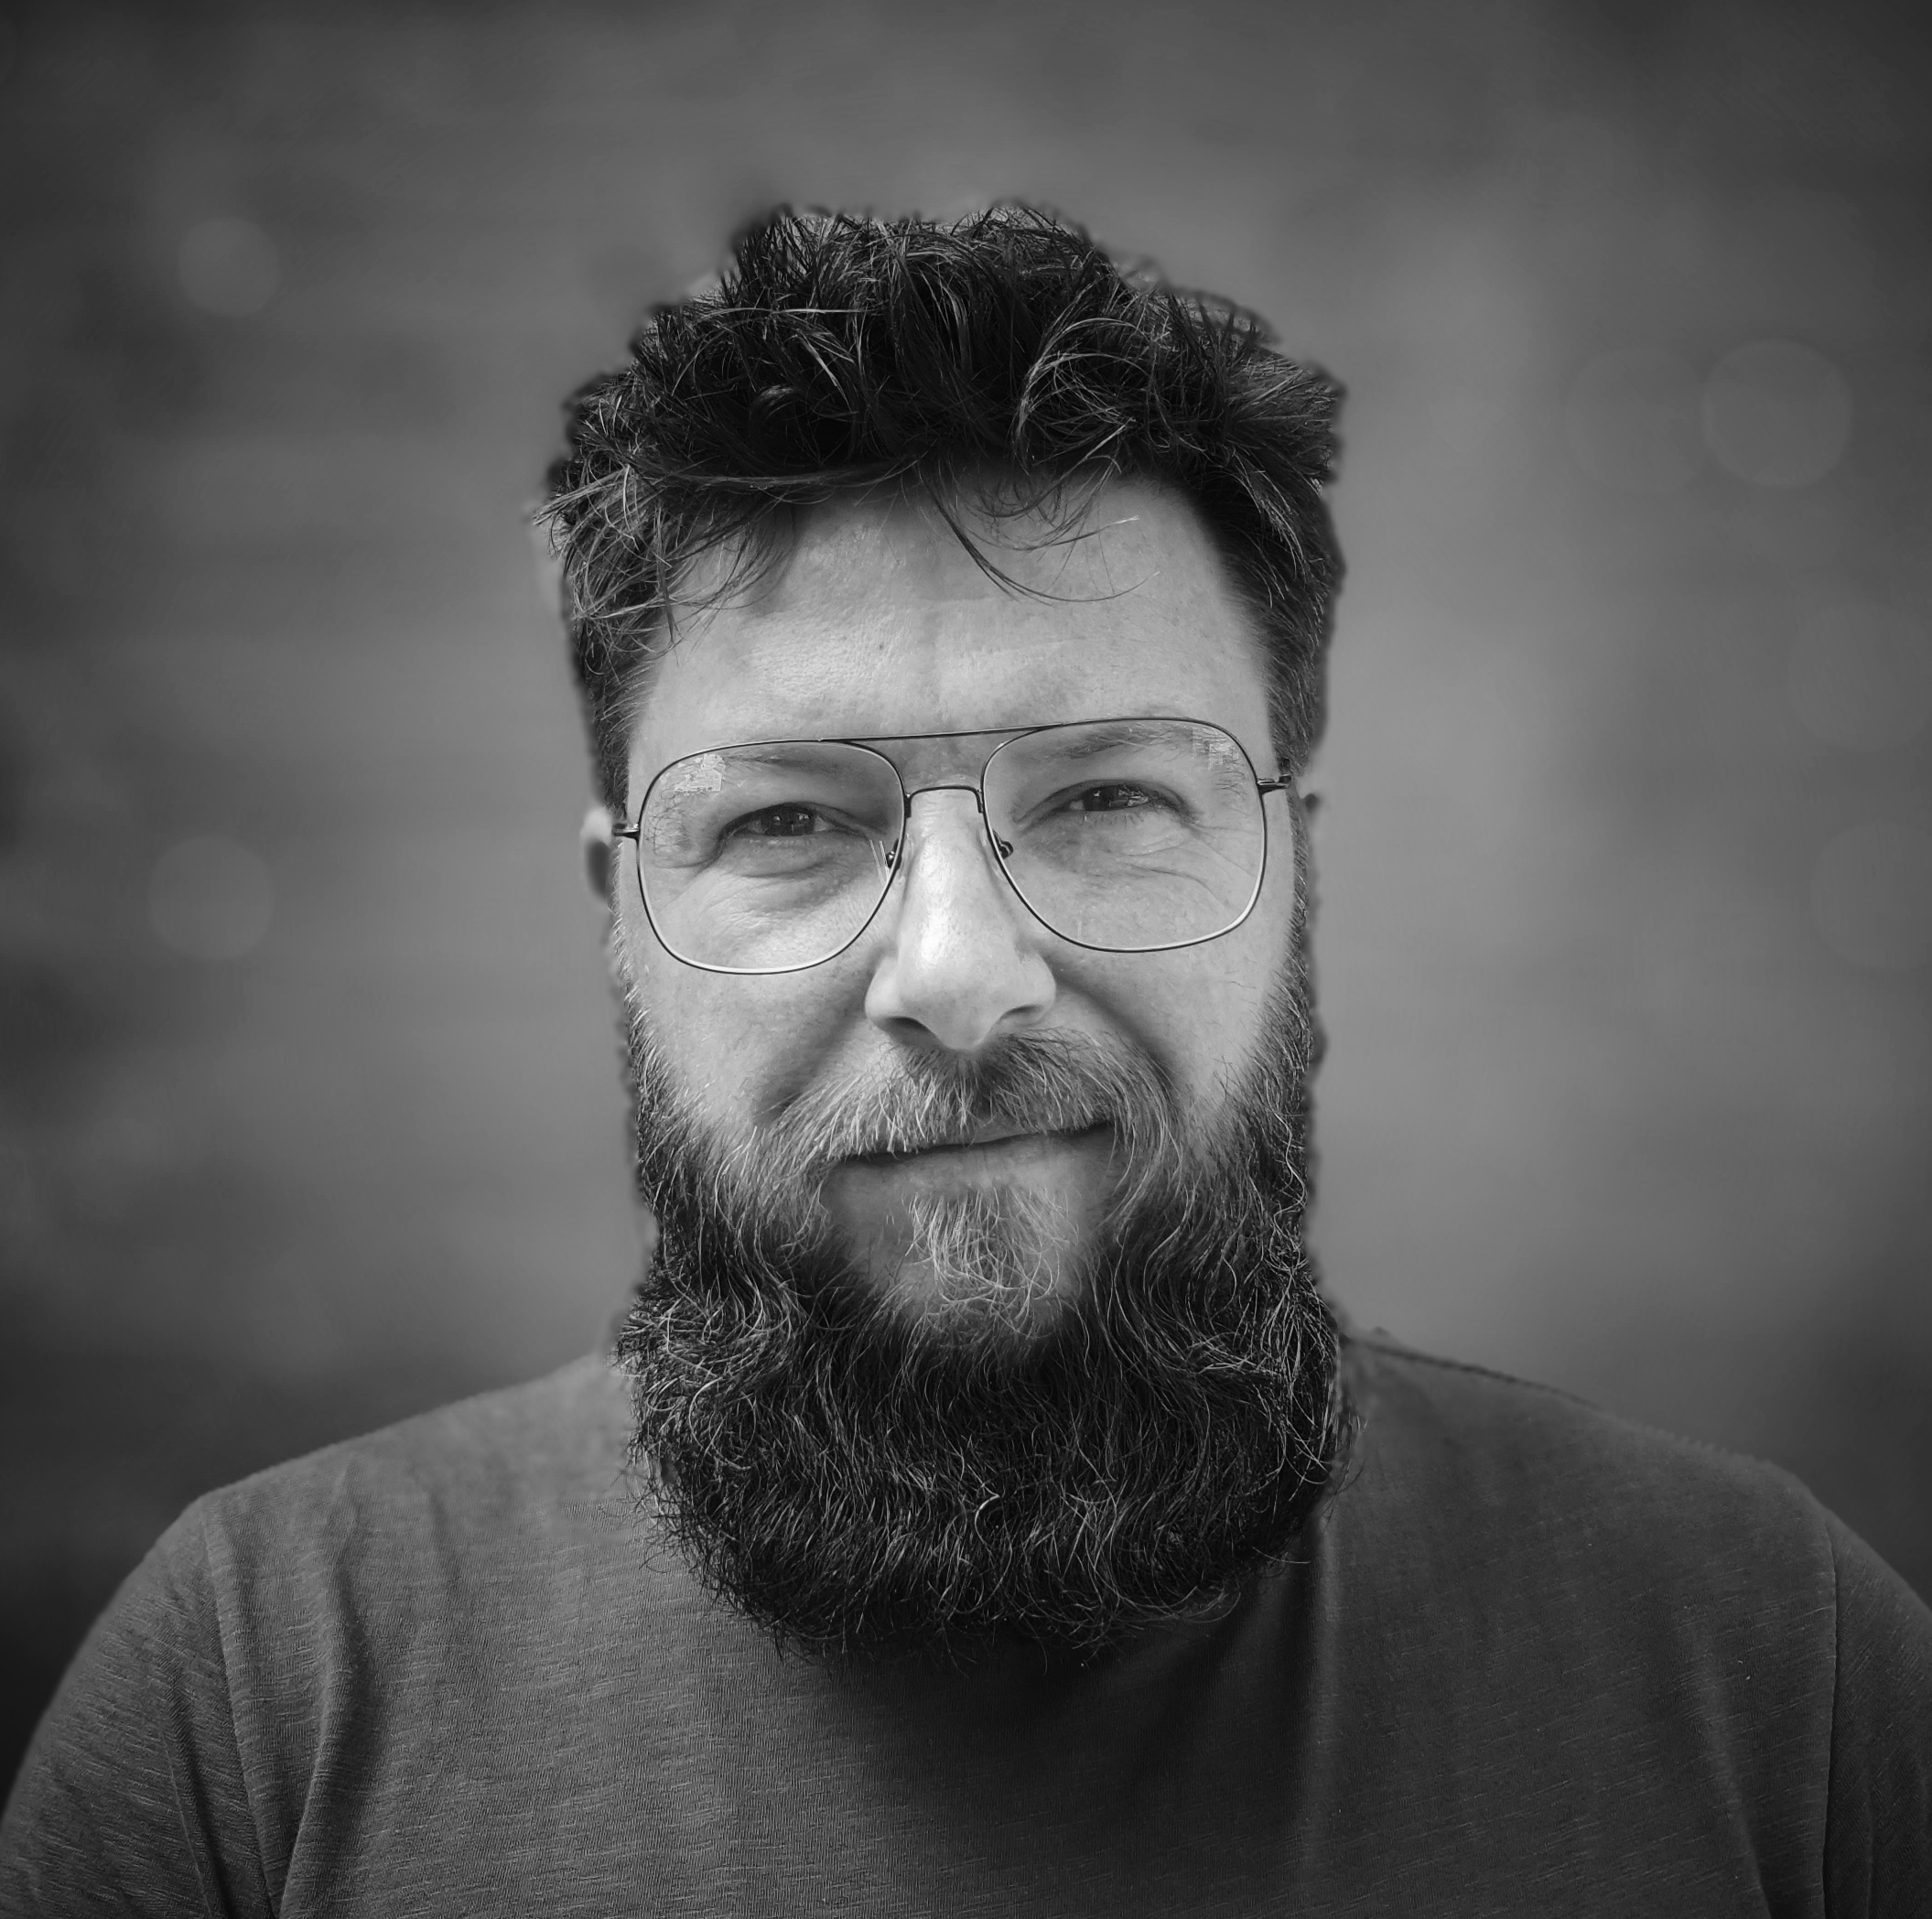 Daniel M. Blaabjerg-Zederkoff